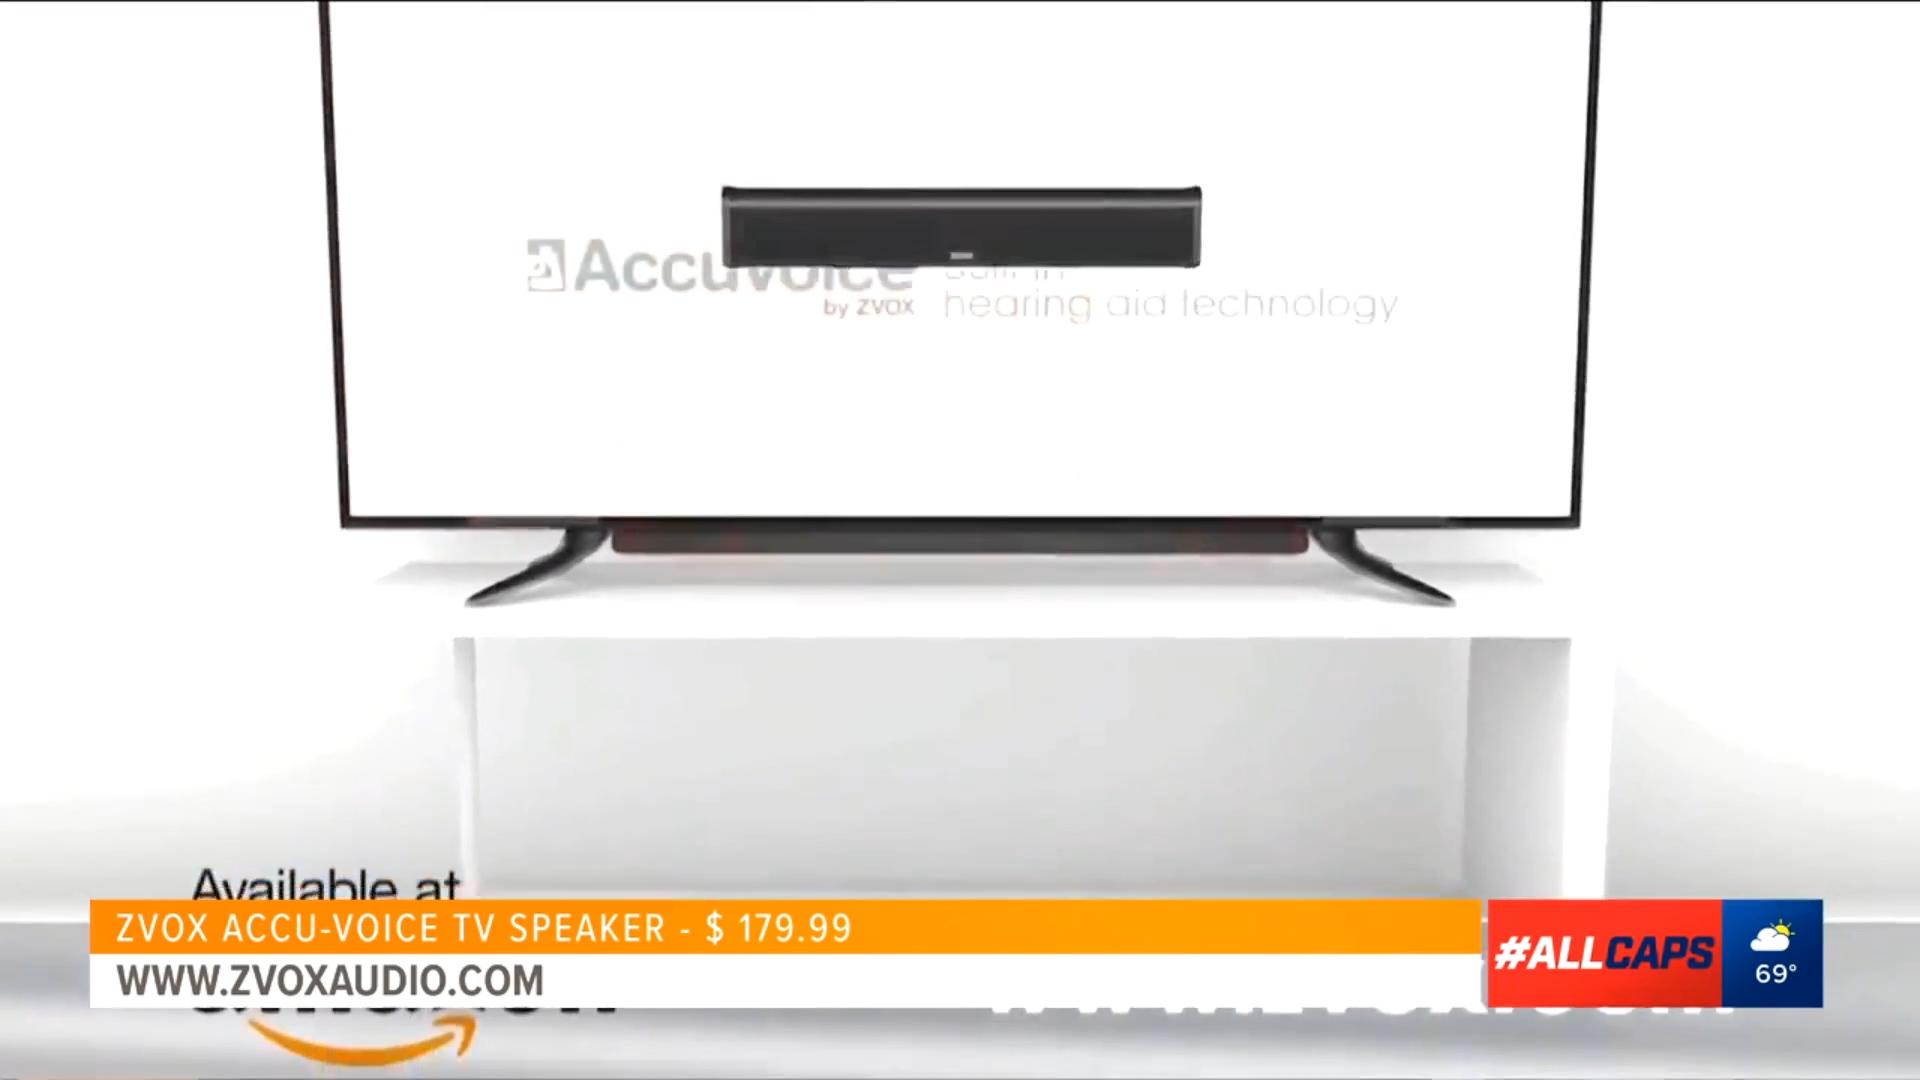 ZVOX Accu-Voice (AV-200) TV SPEAKER w/Hearing Aid Tech - $179.99 saleShop Now